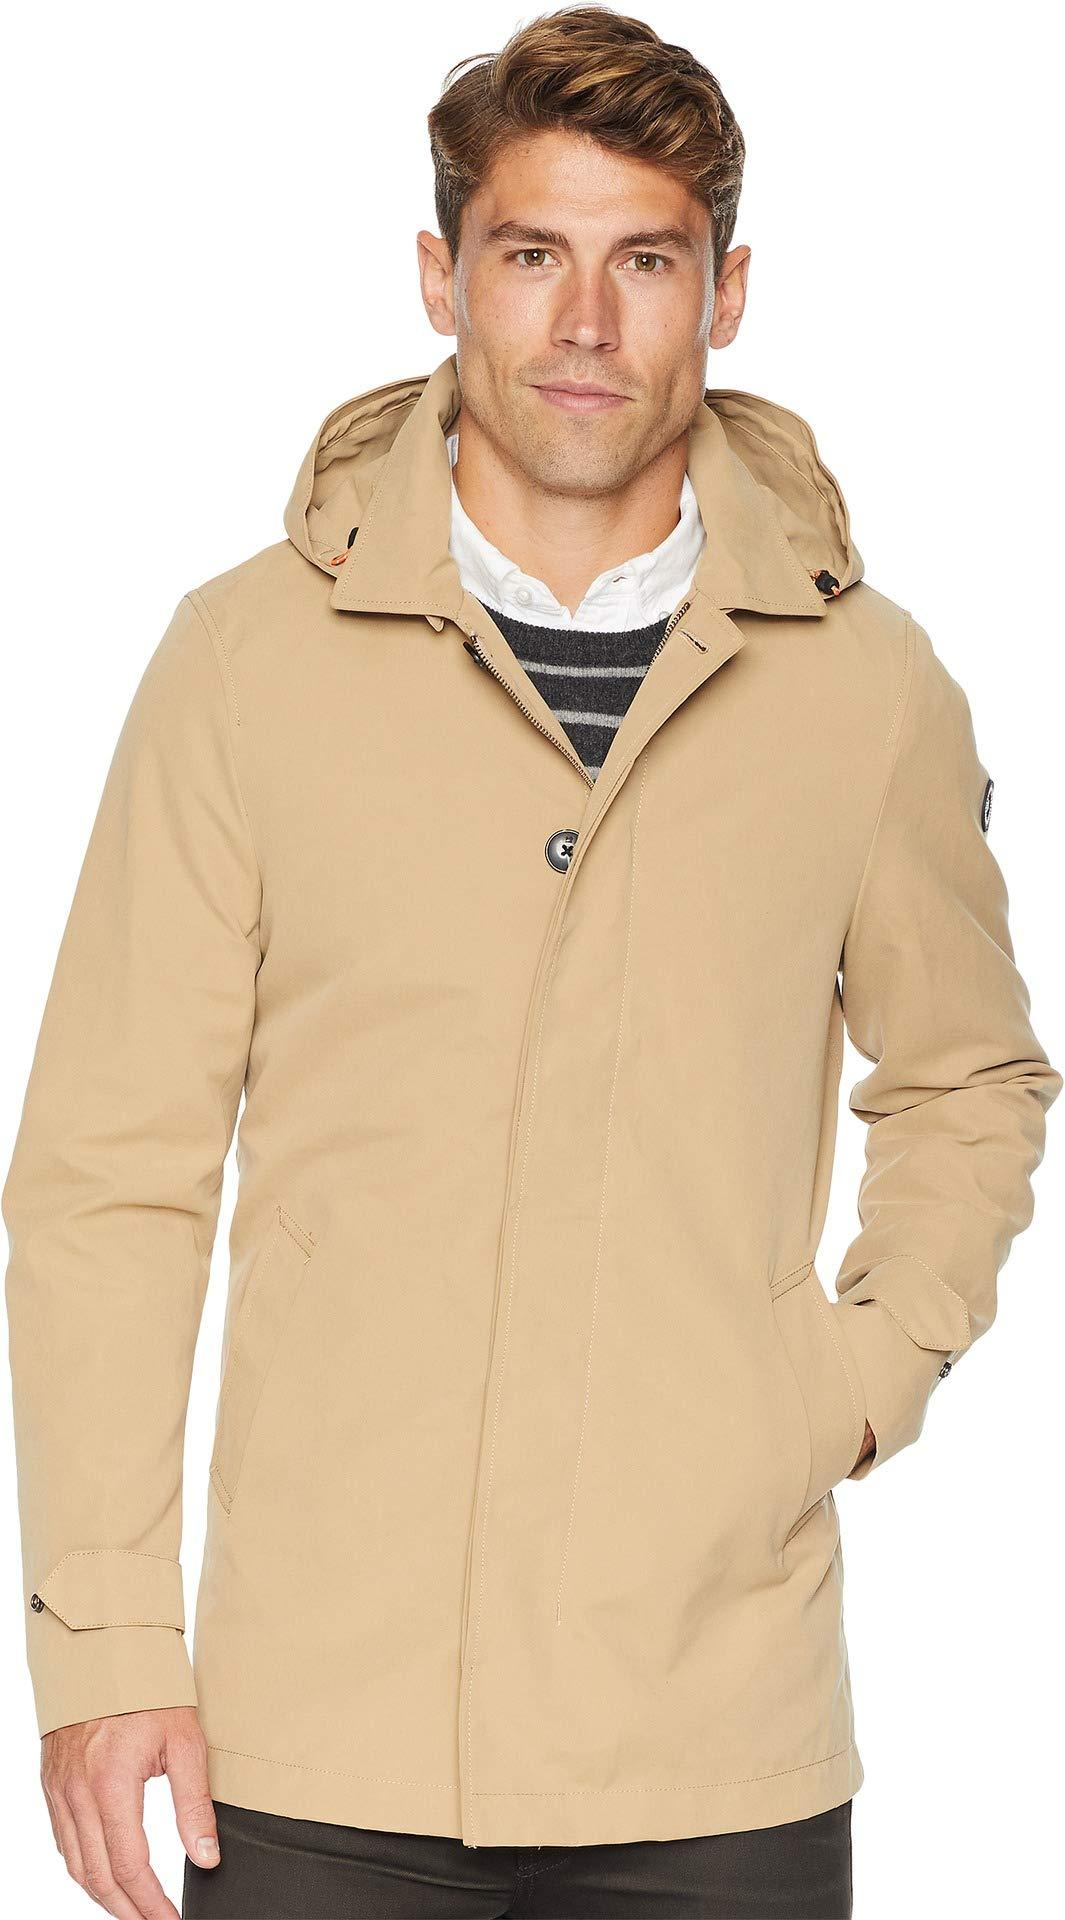 Scotch & Soda Men's Classic Parka Jacket w/Fixed Inner Body Warmer Sand Medium